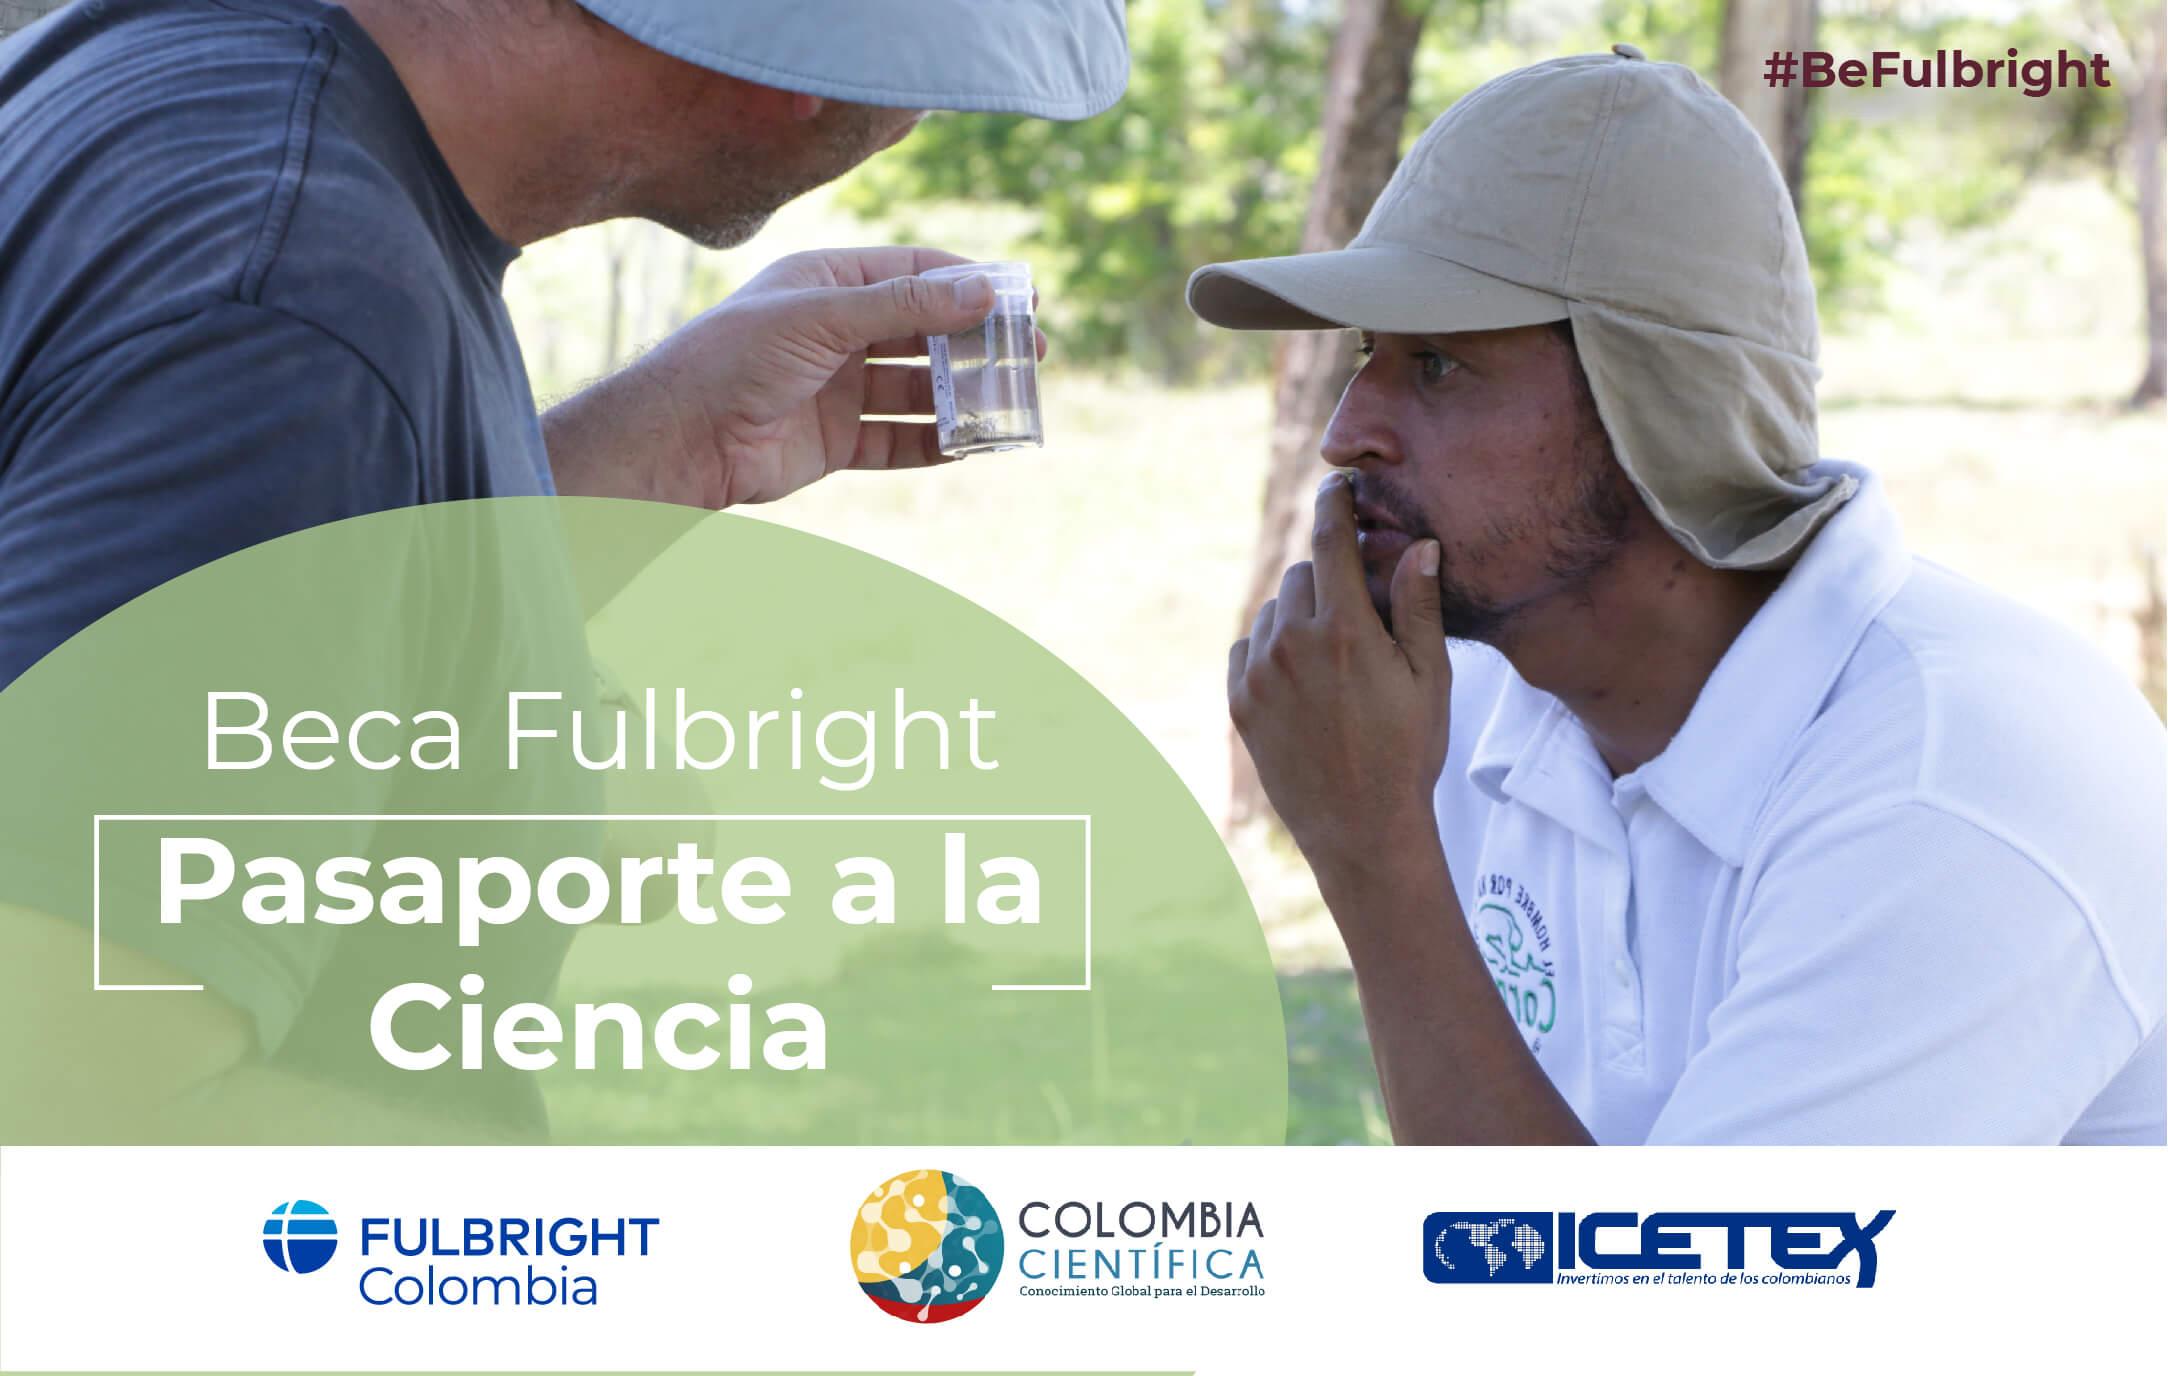 Beca Fulbright «Pasaporte a la Ciencia» cohorte 2021